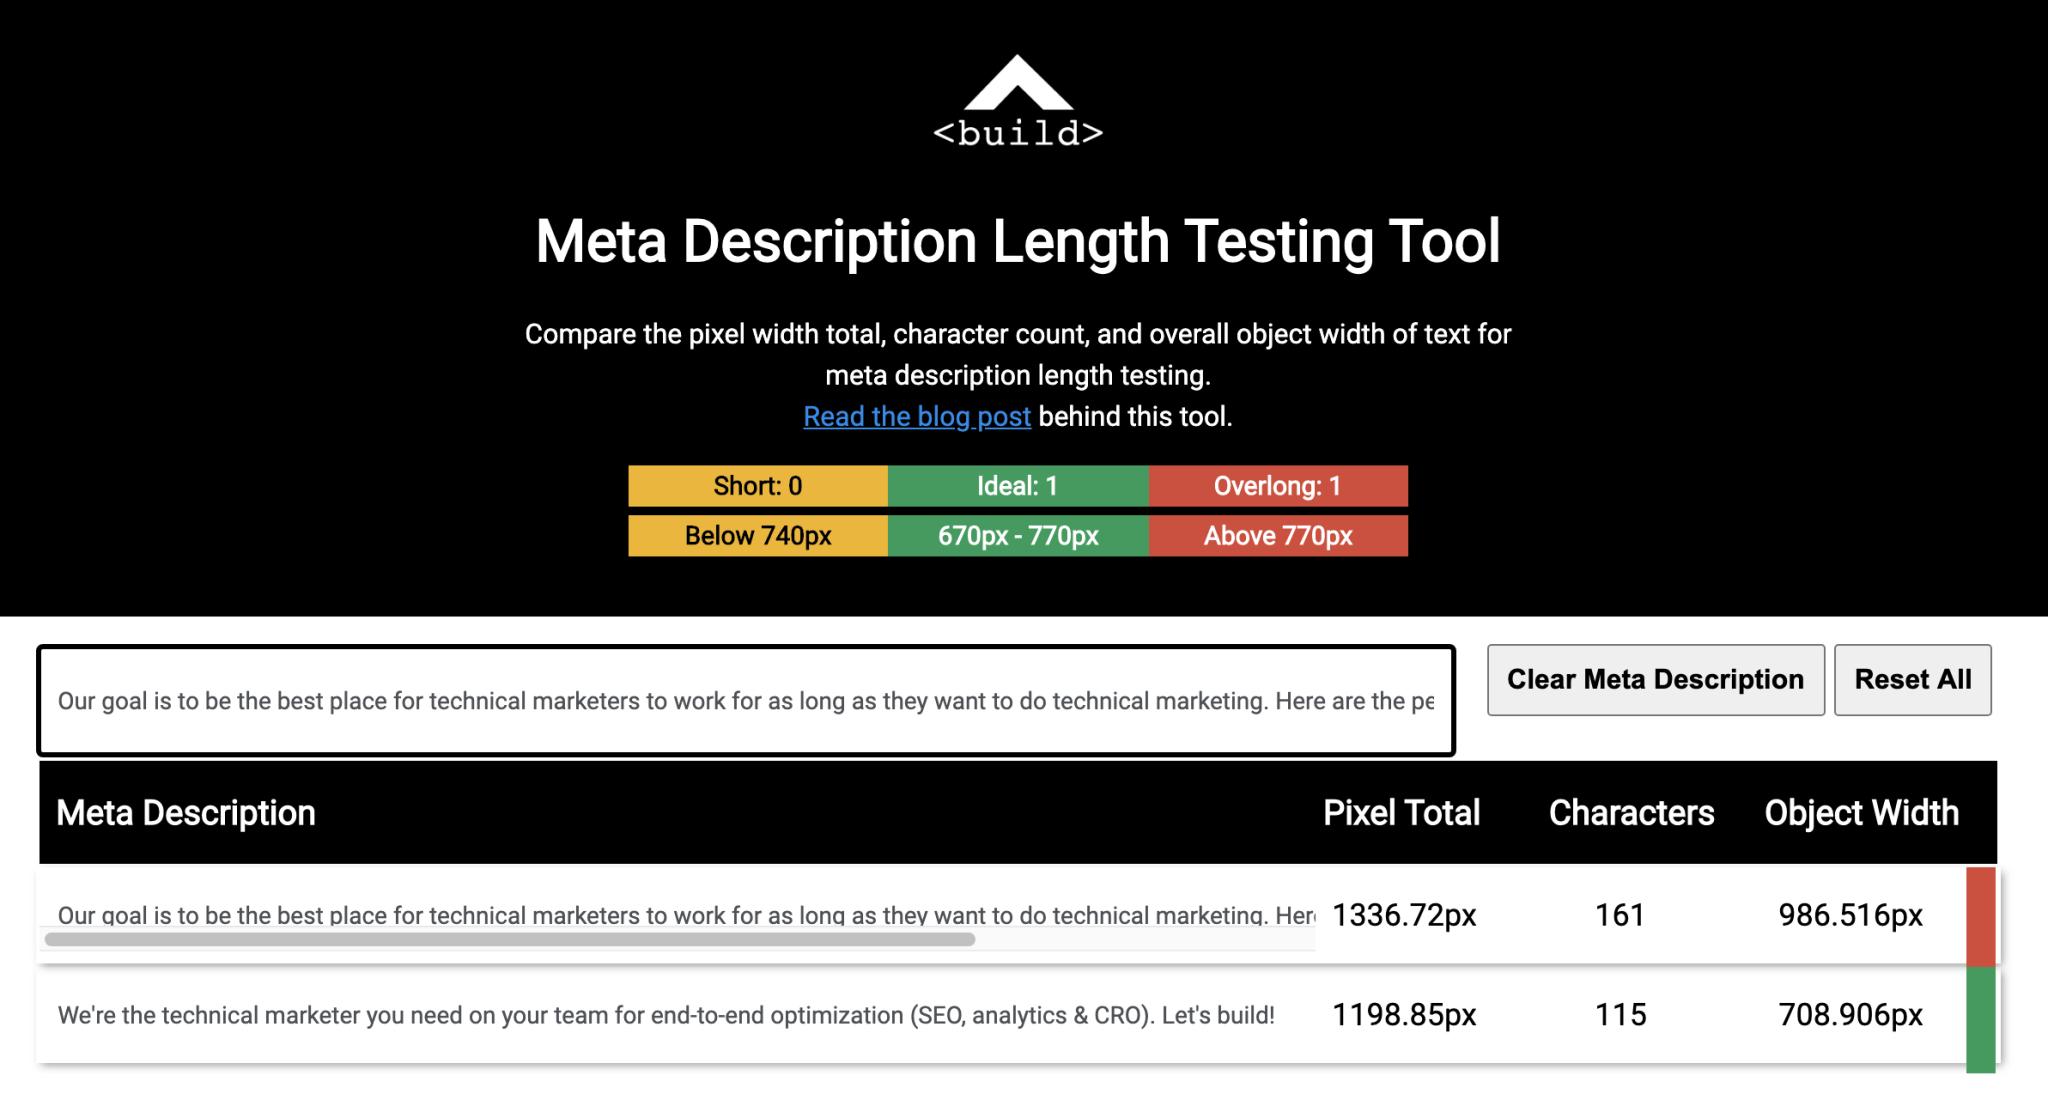 Meta Description Length Testing Tool